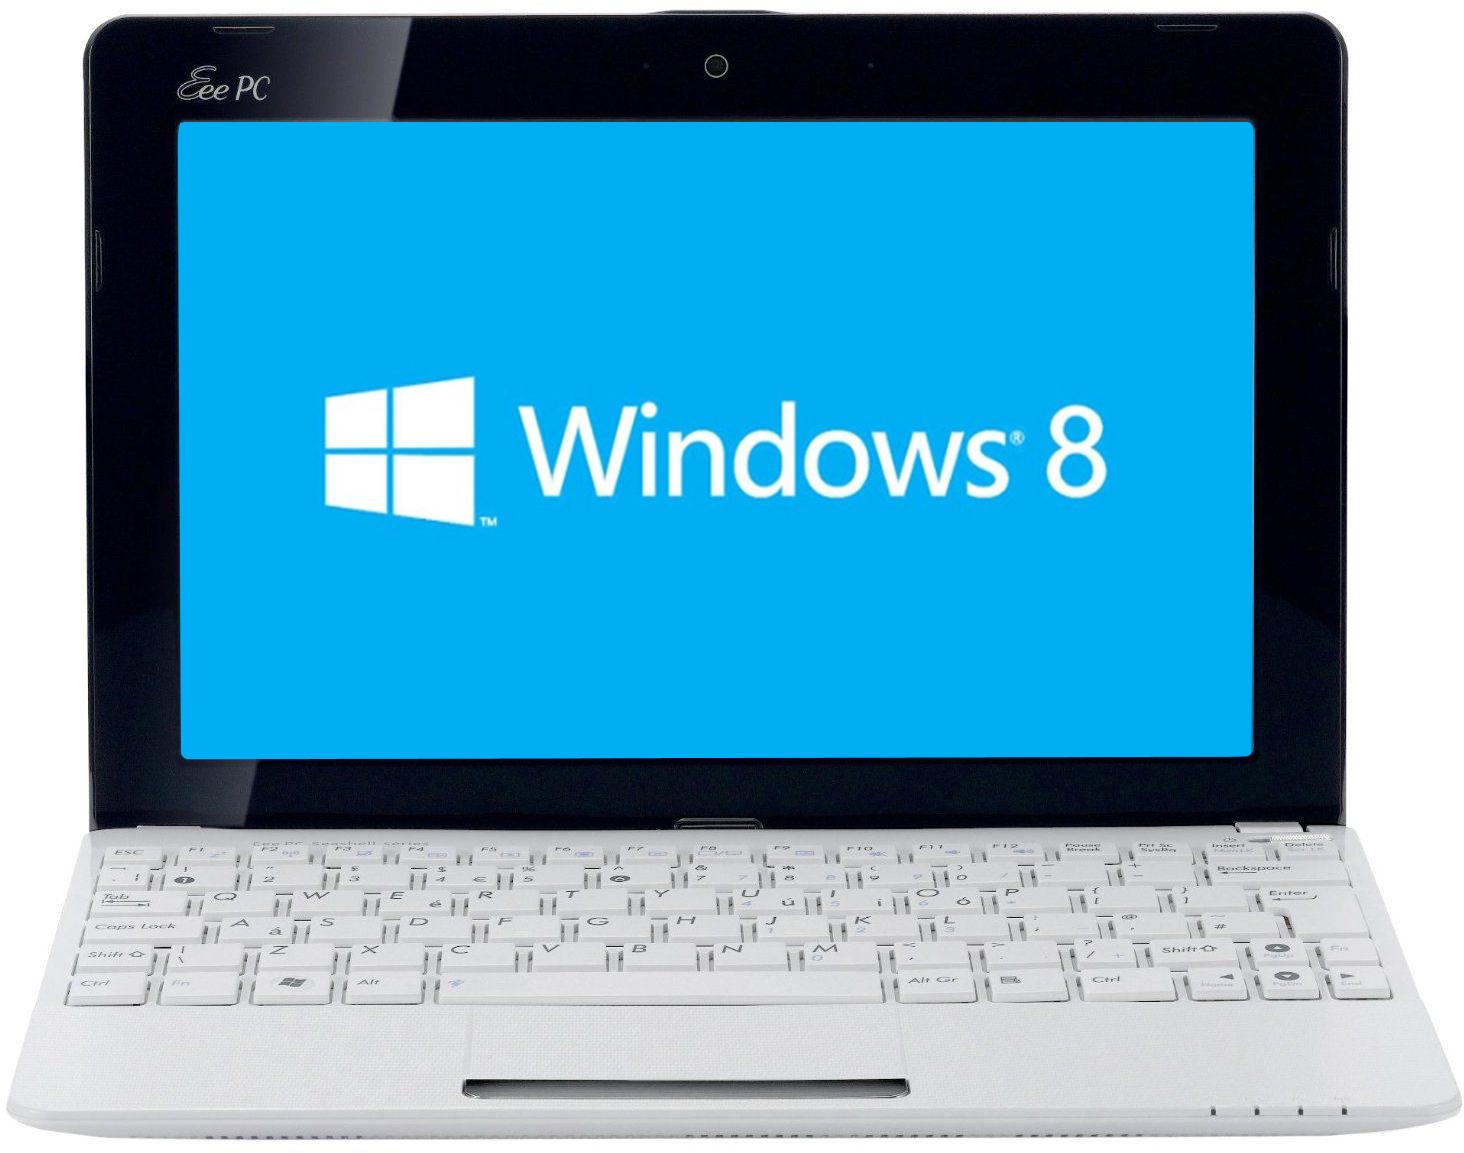 ASUS Eee PC 1008HA Seashell (Windows 7) Review